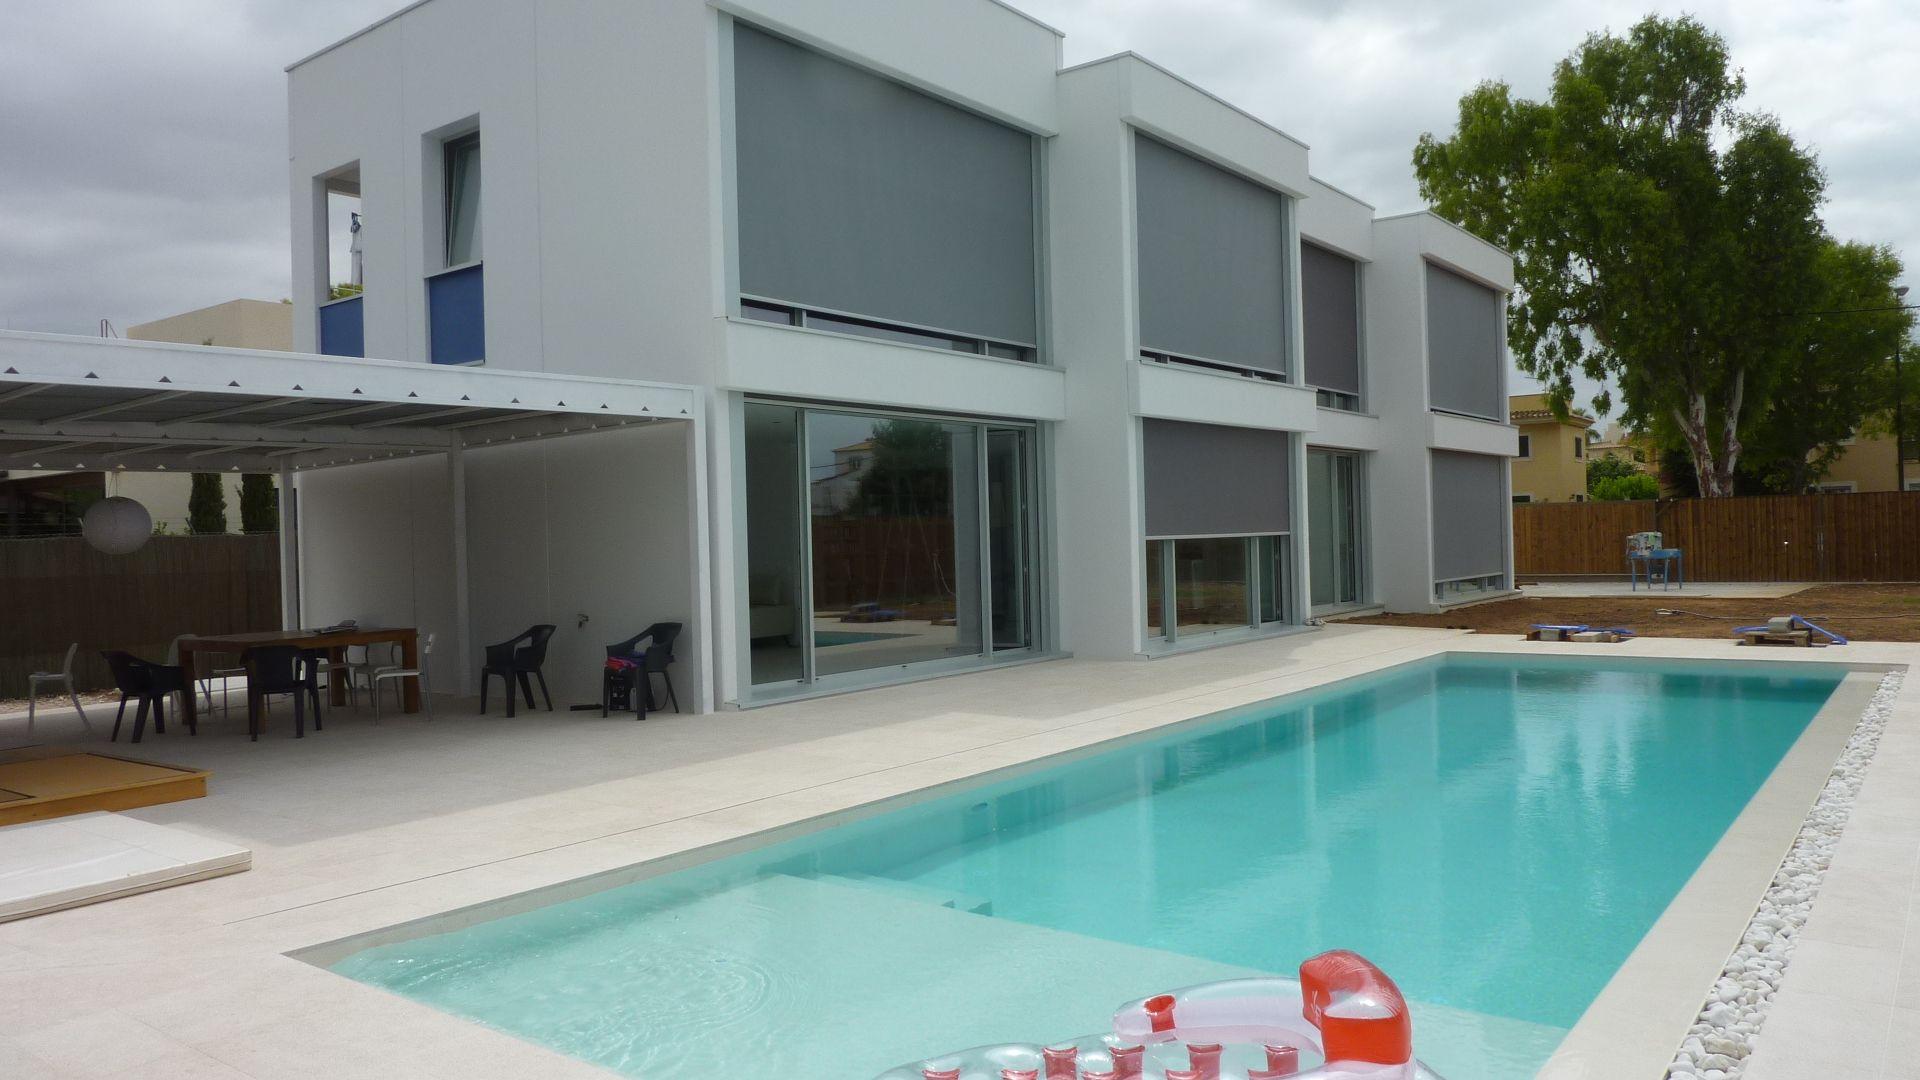 Exterior piscina porche moderno casas via for Muebles porche